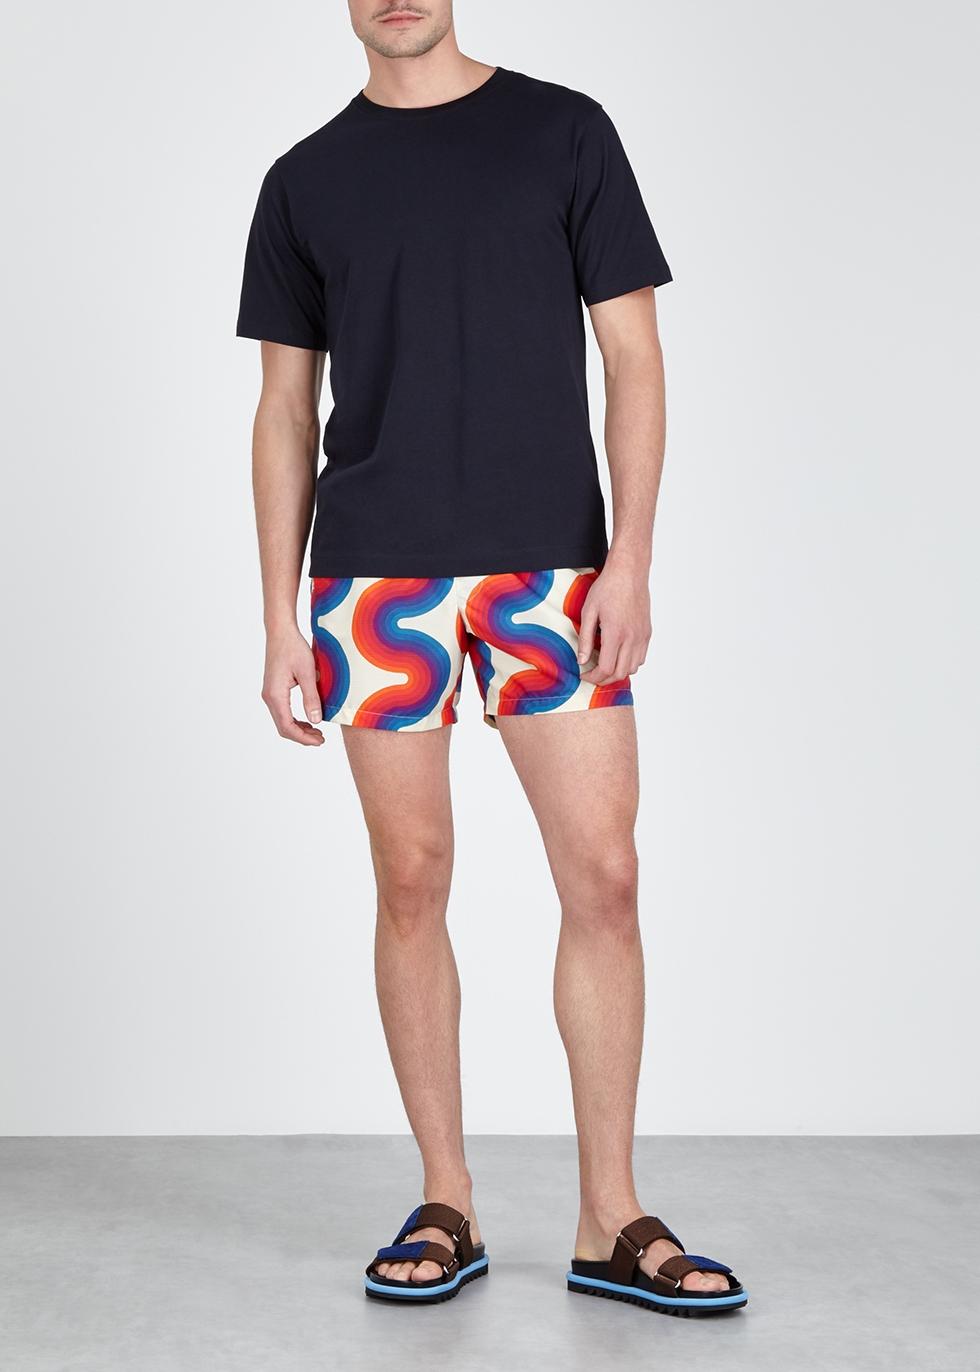 30f9a18fe9 Dries Van Noten X Verner Panton Phibbs printed swim shorts - Harvey Nichols